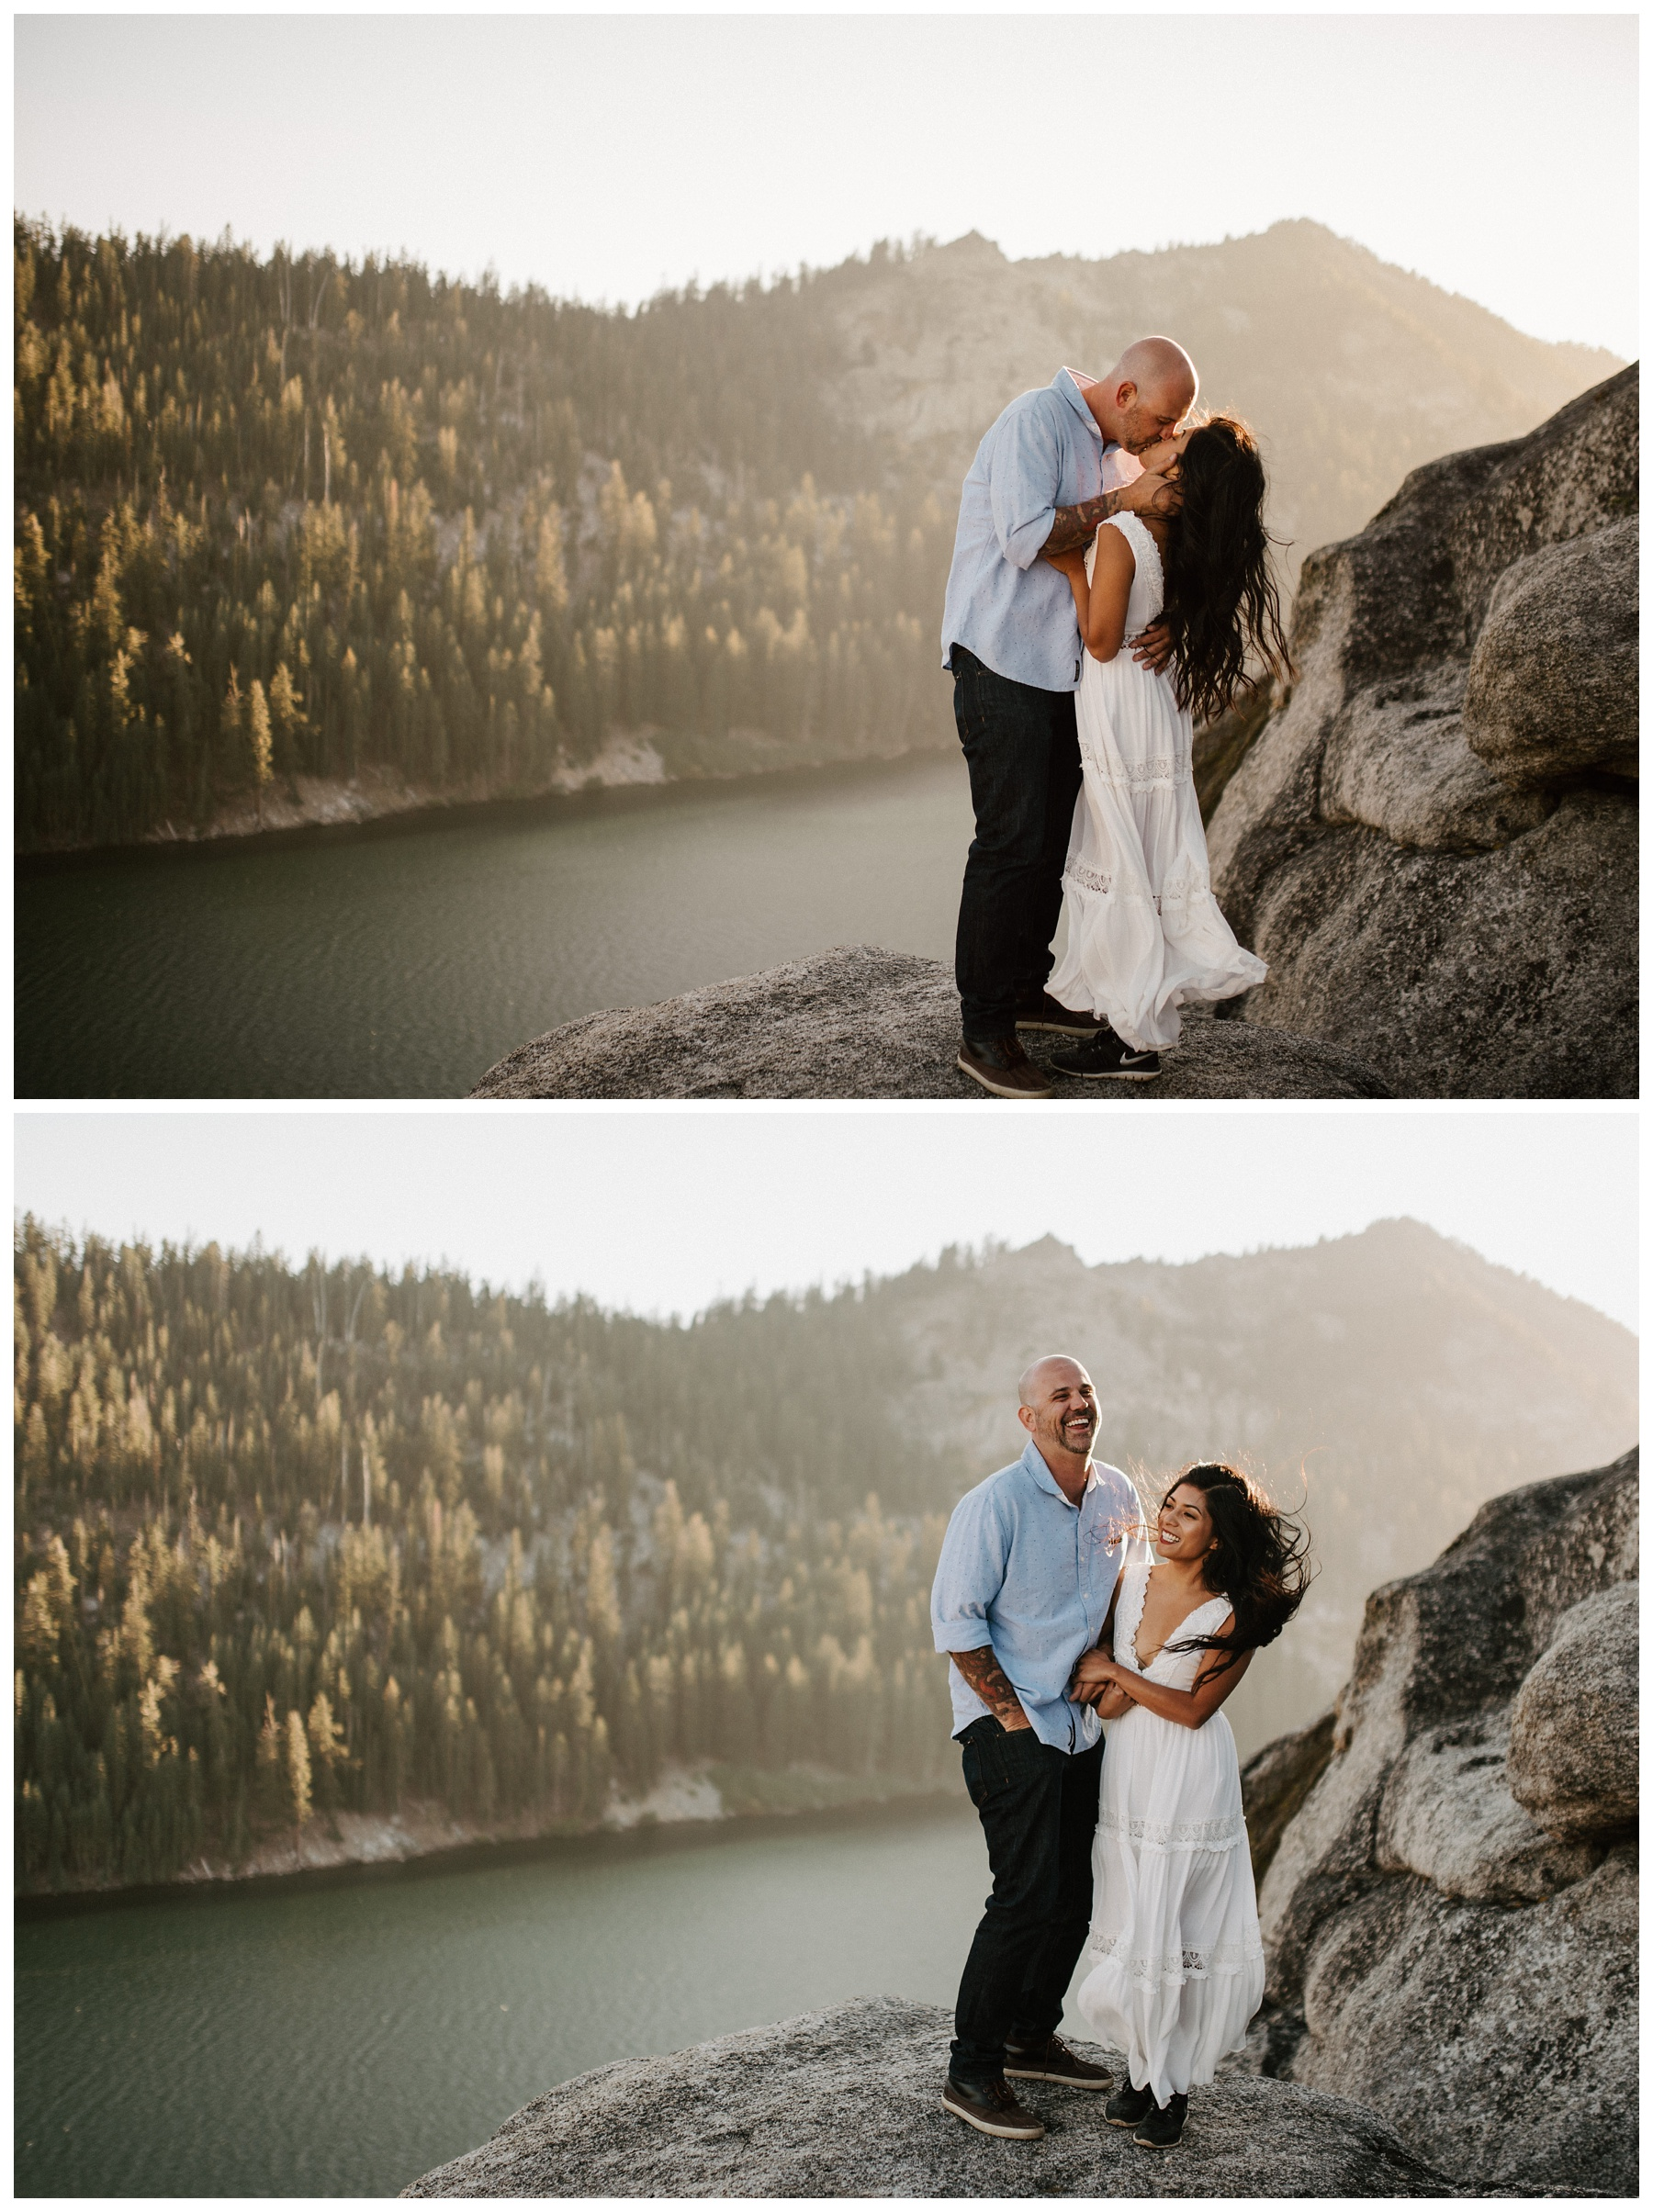 Lake_Tahoe_Elopment_0060.jpg